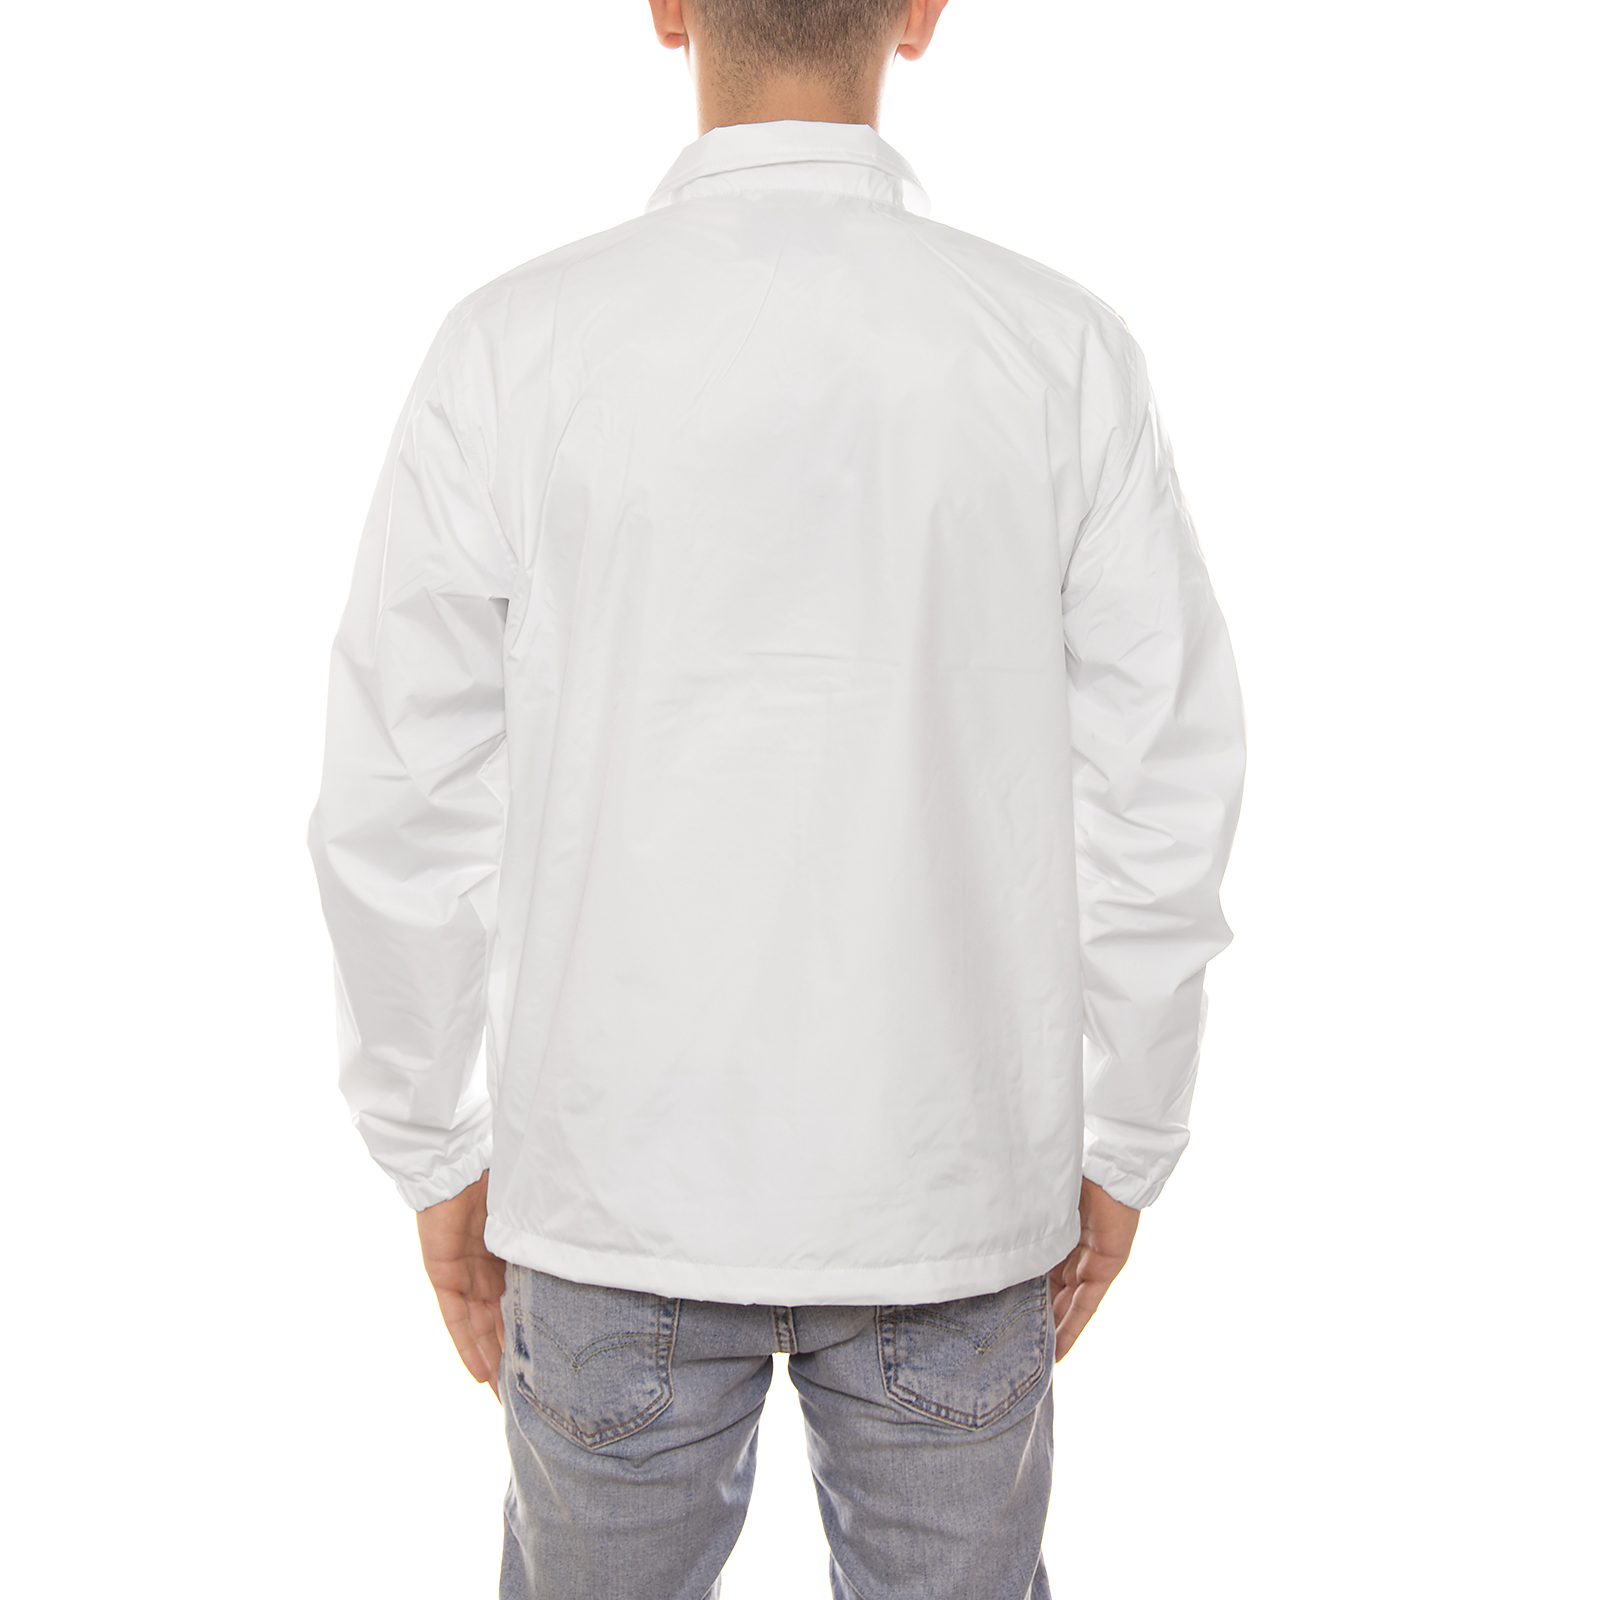 Carhartt-giacca-Strike-Coach-Jacket-Nylon-Tafetta-2-4-Oz-White-Black